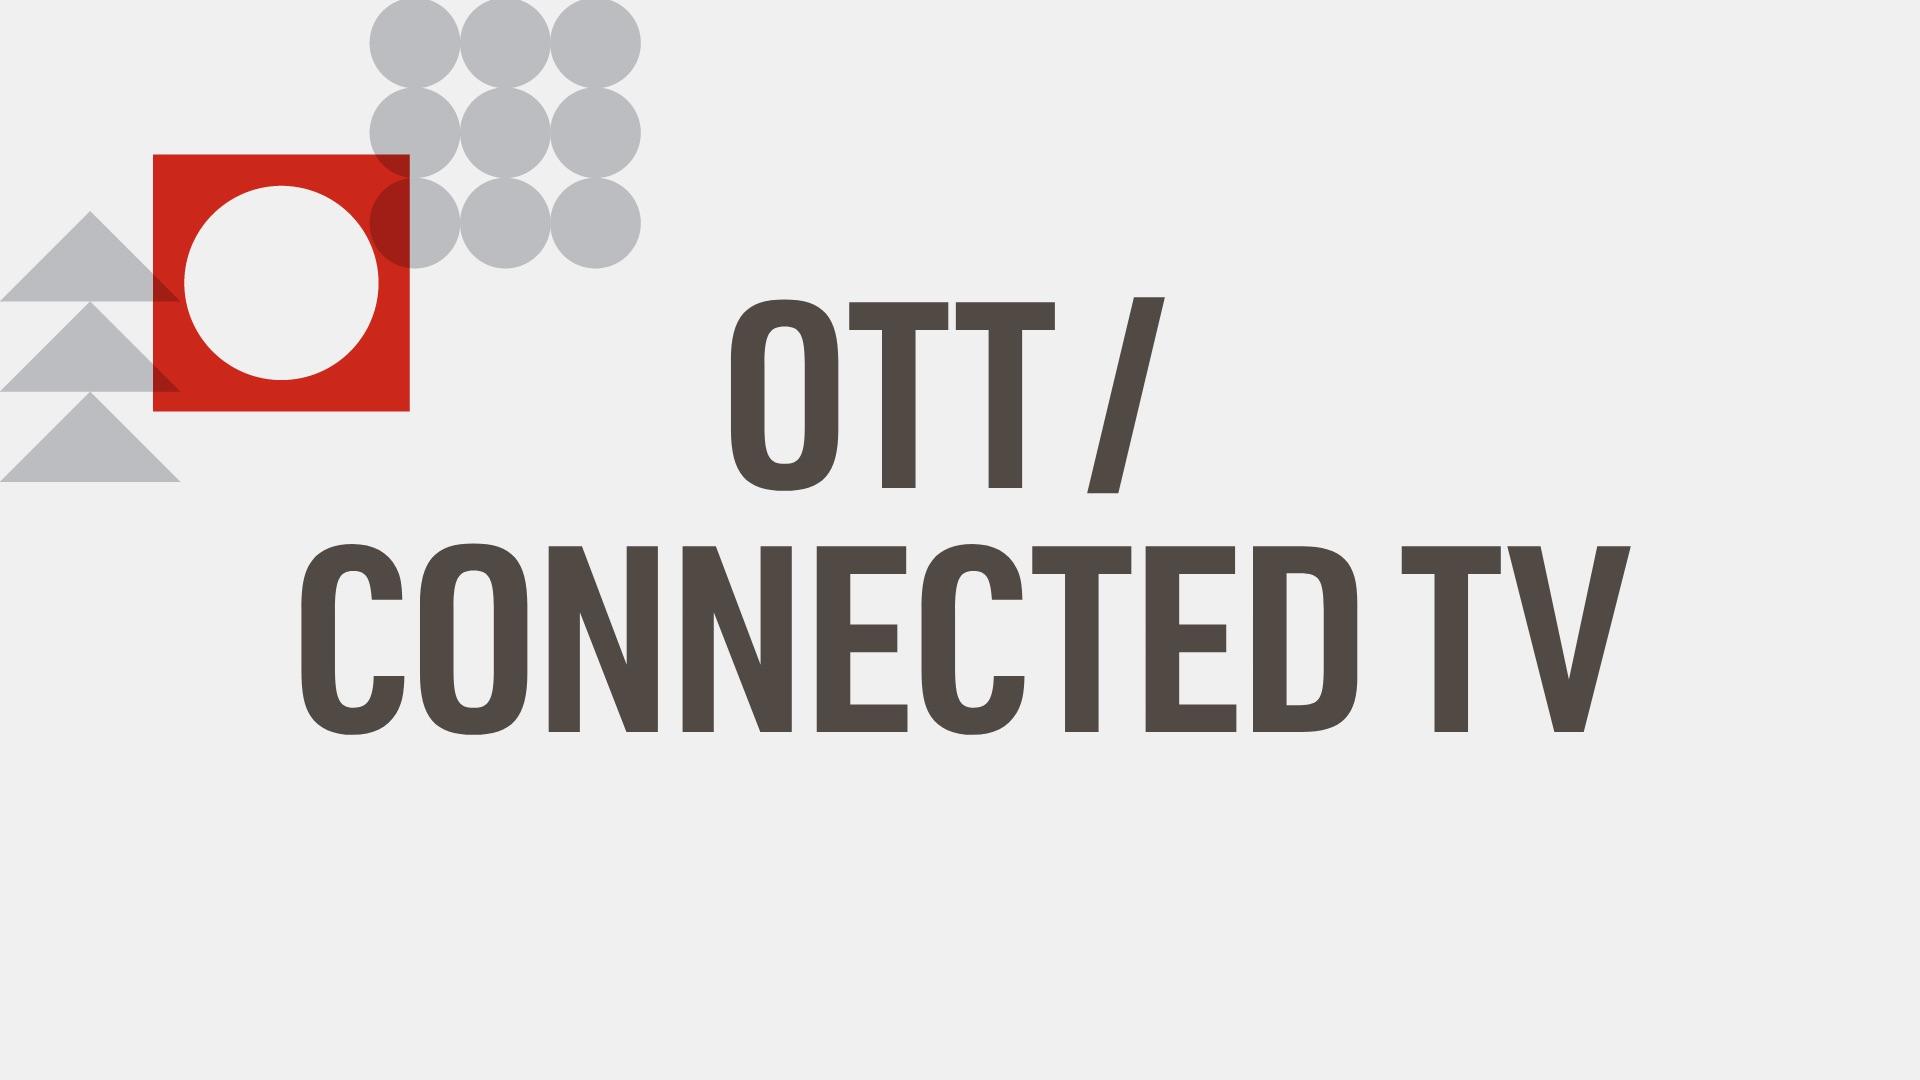 Advanced advertising - OTT / Connected TV